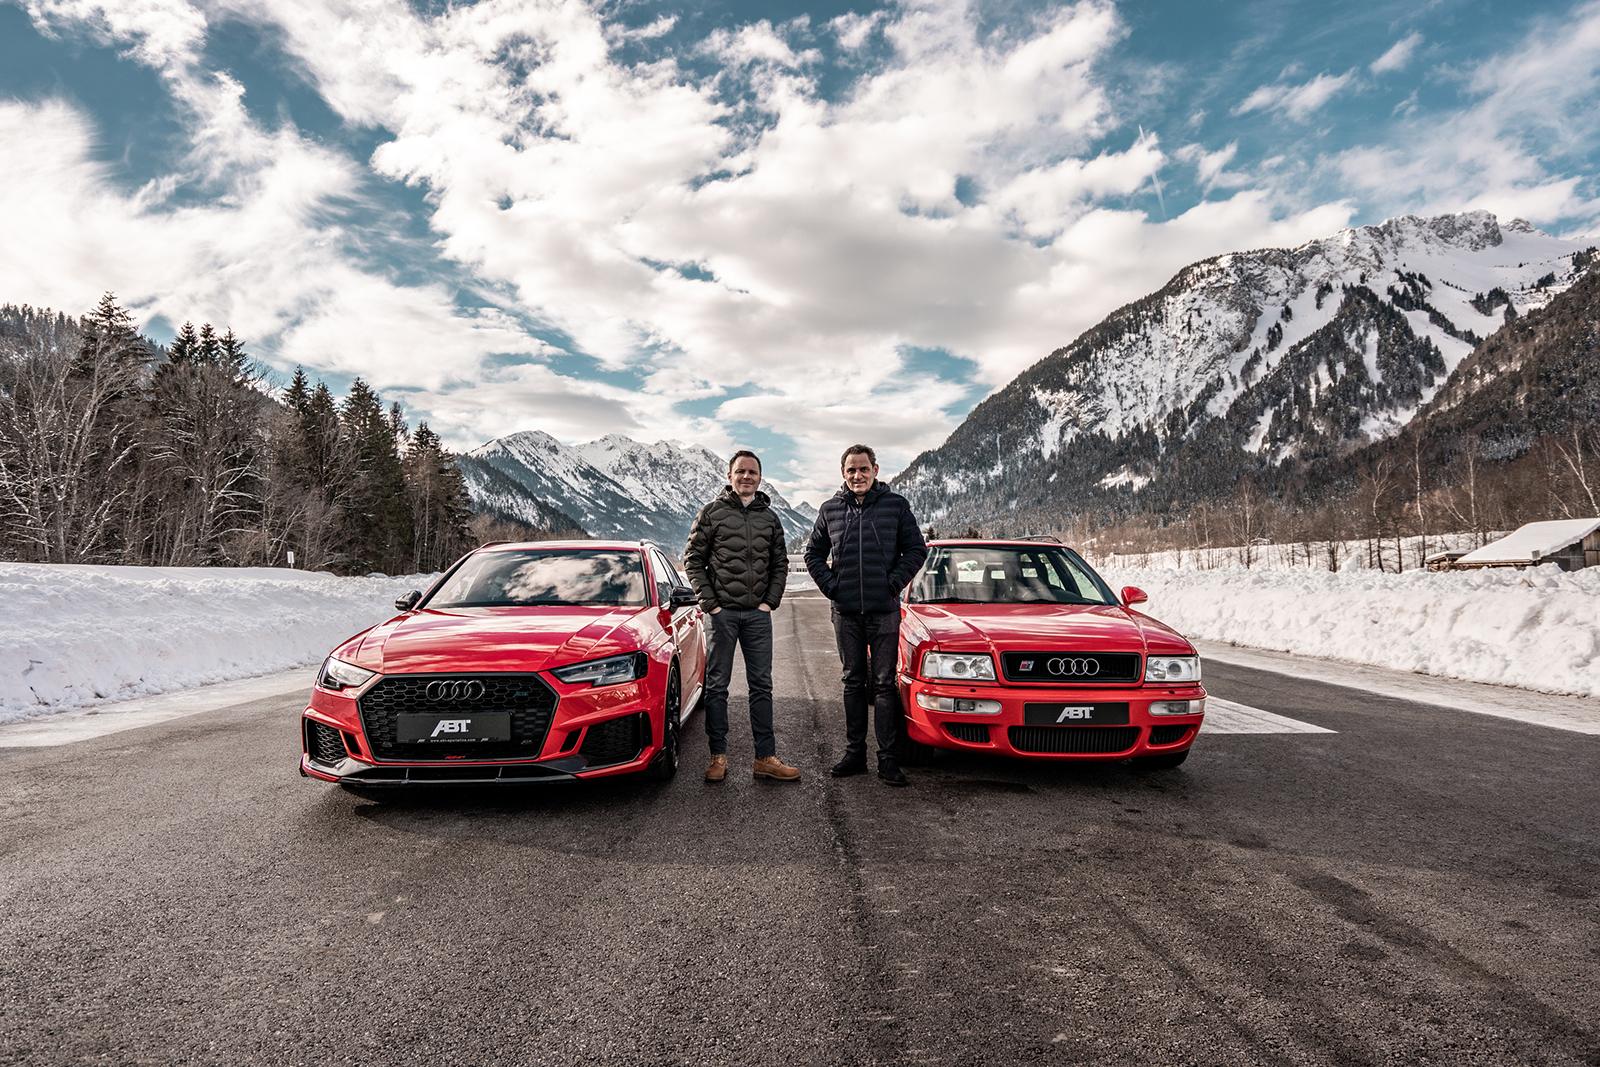 ABT_RS4+_Audi_RS2_10_Rolf_Michl_ABT_Hans-JÅrgen_Abt